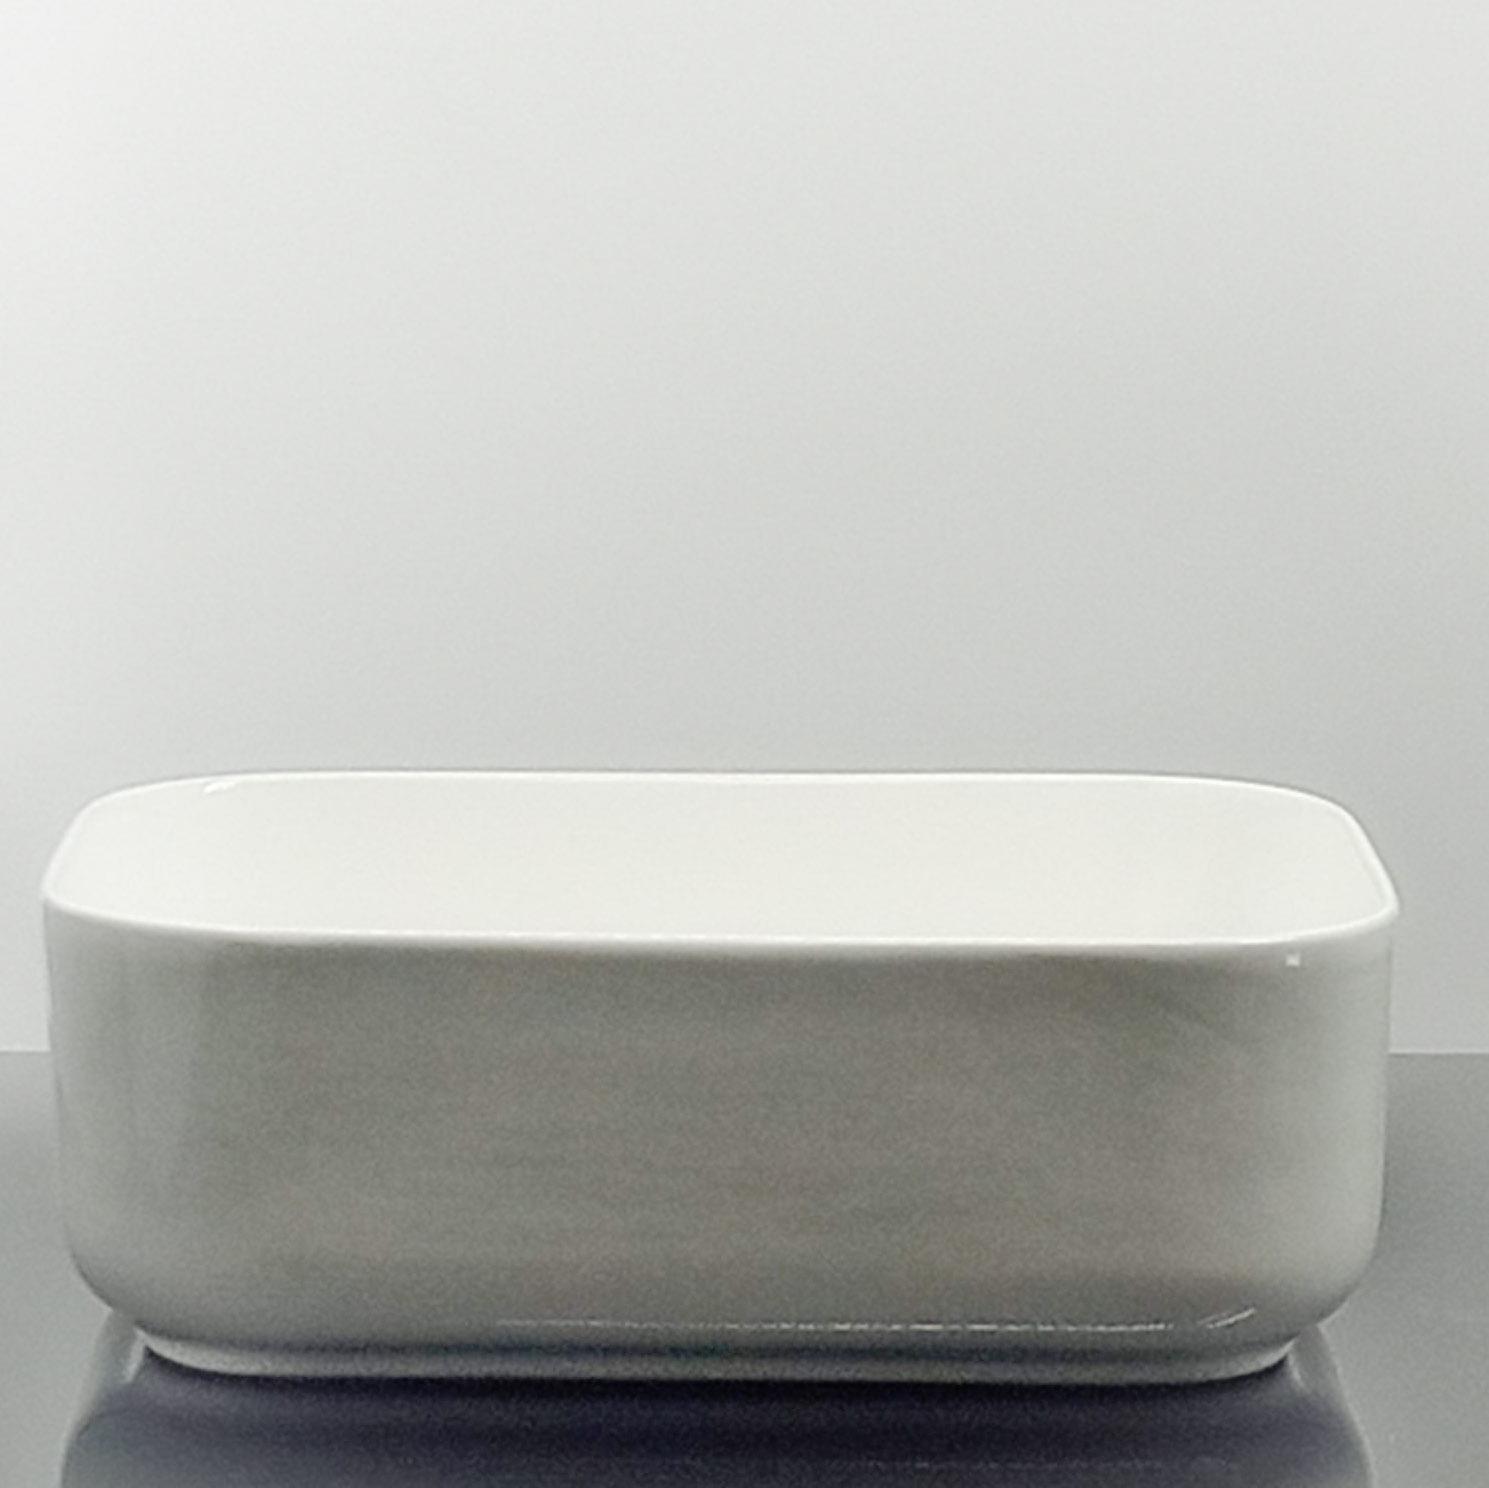 LAVCB40X30X14   Lavabo Cerámico Blanco Brillo